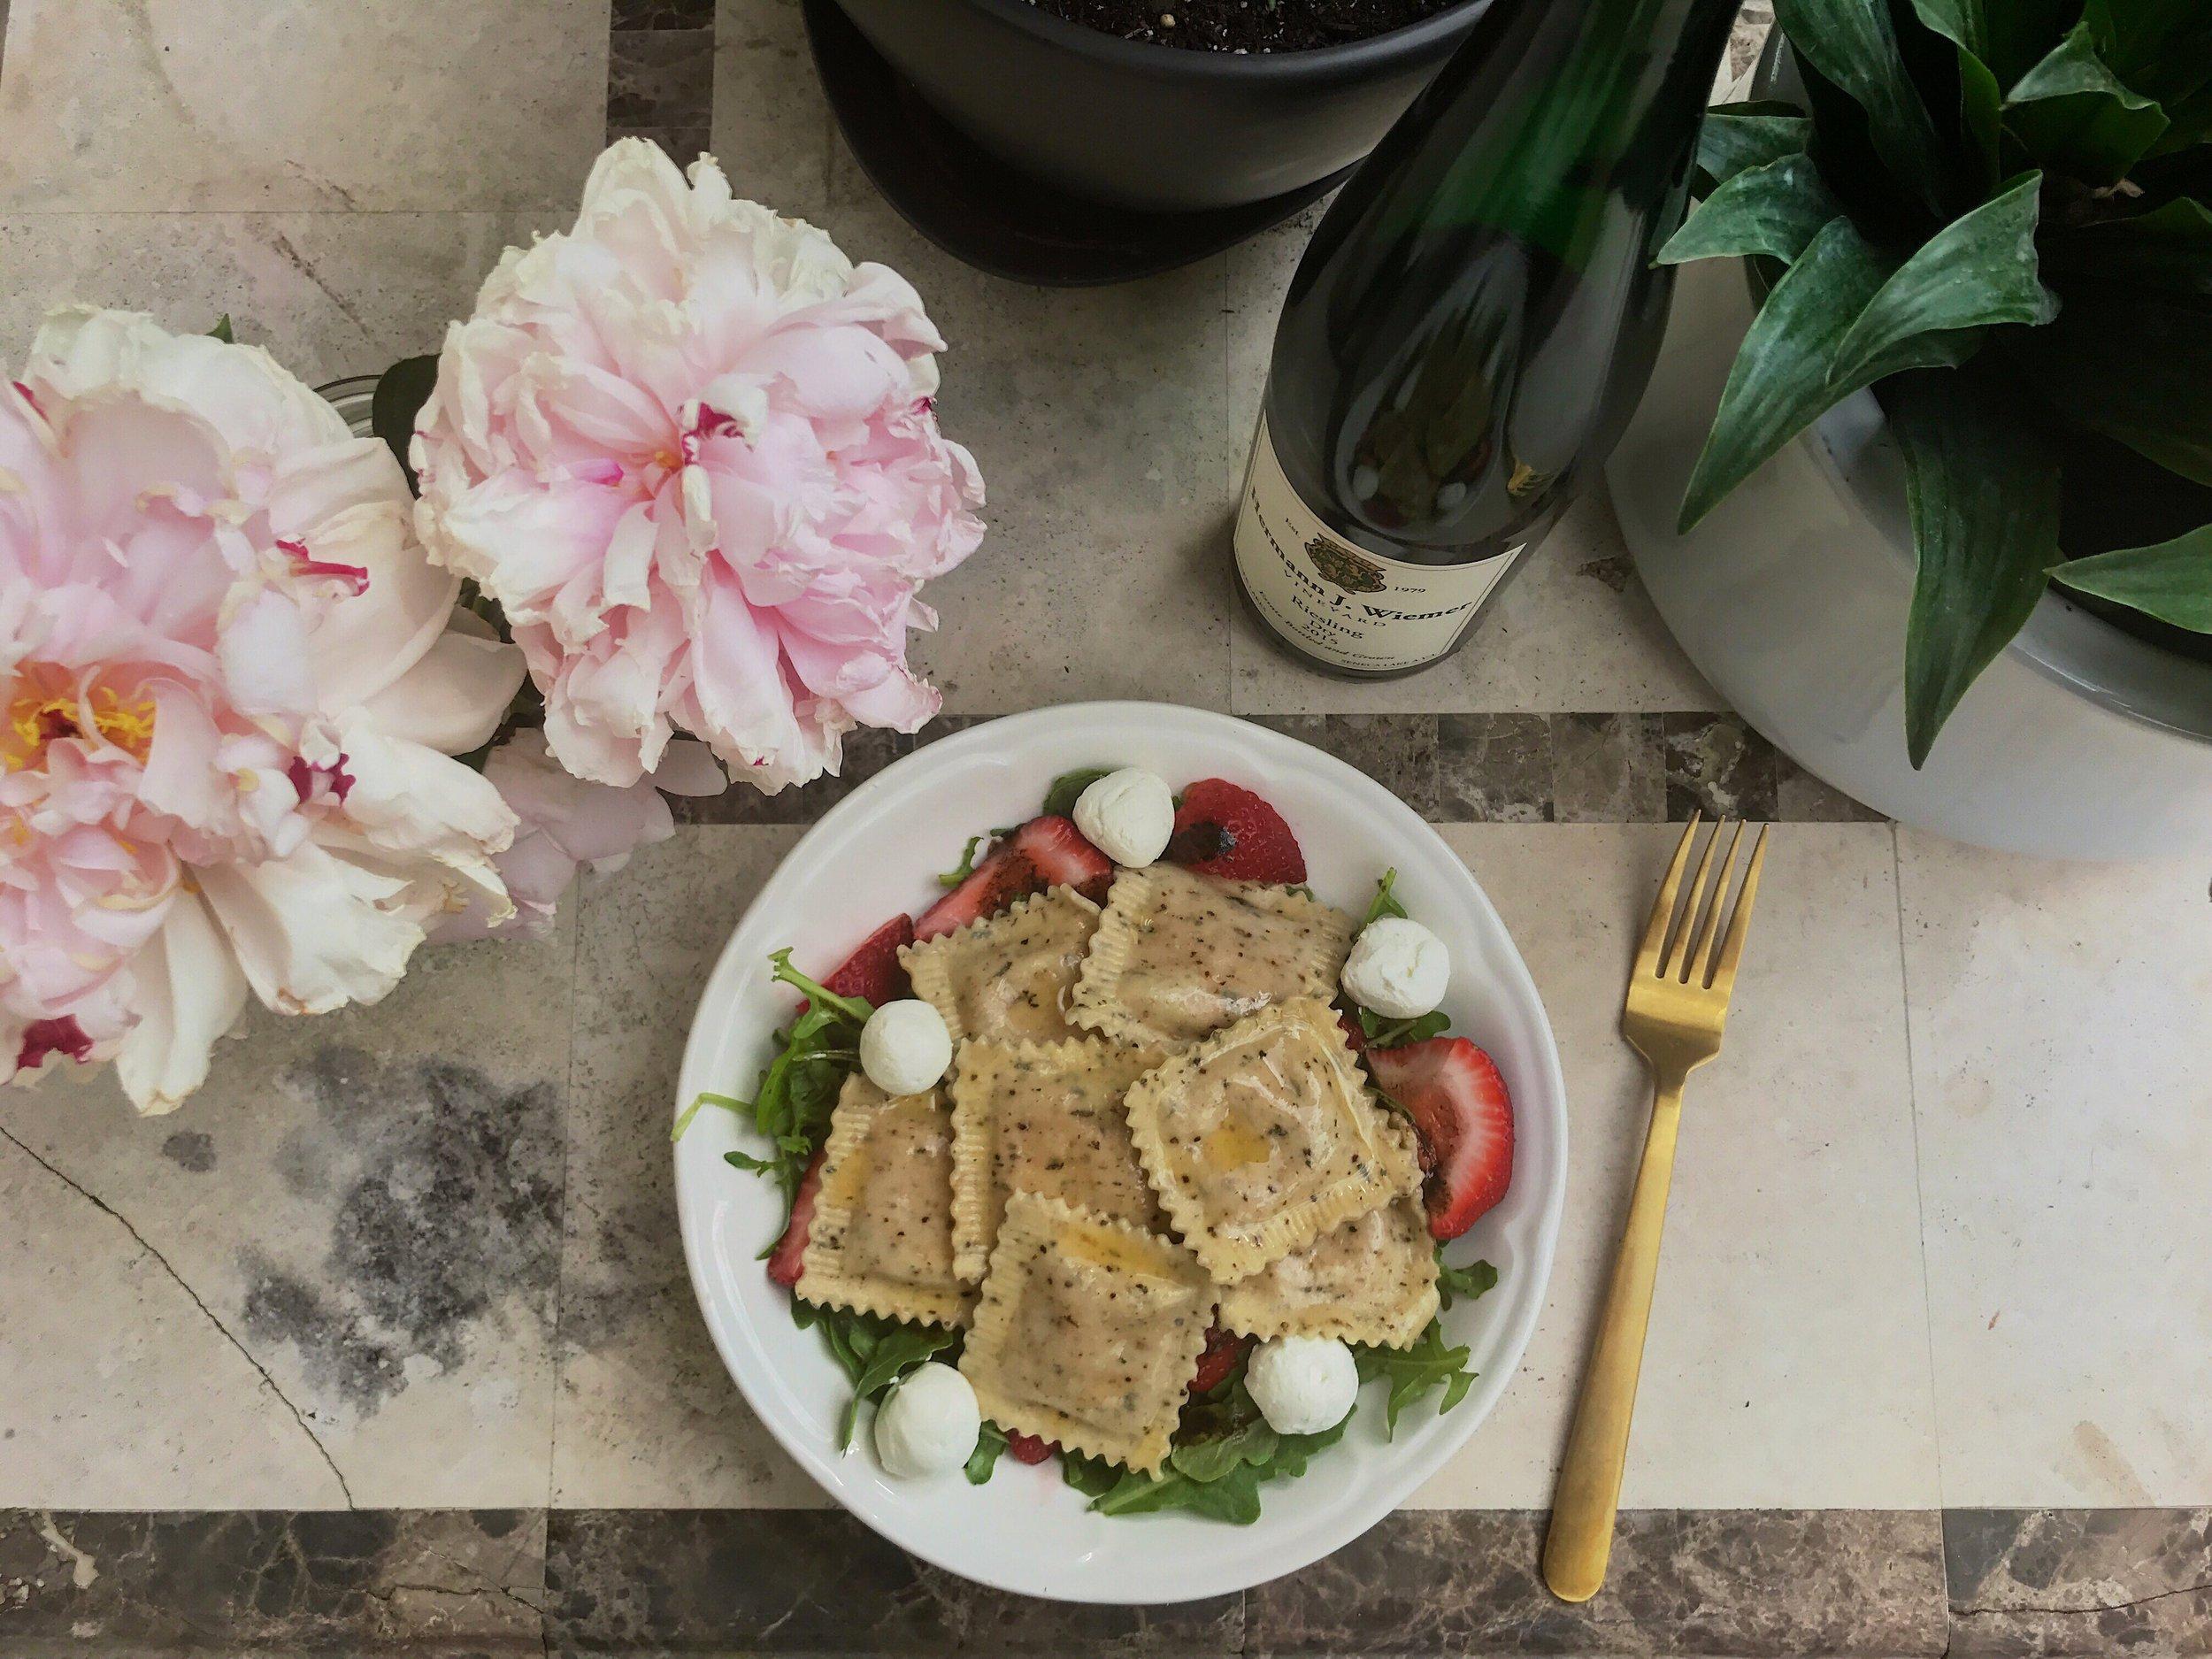 Valicenti Pasta Farm's Strawberry & Chèvre w/ Lemon, Black Pepper, & Thyme Ravioli